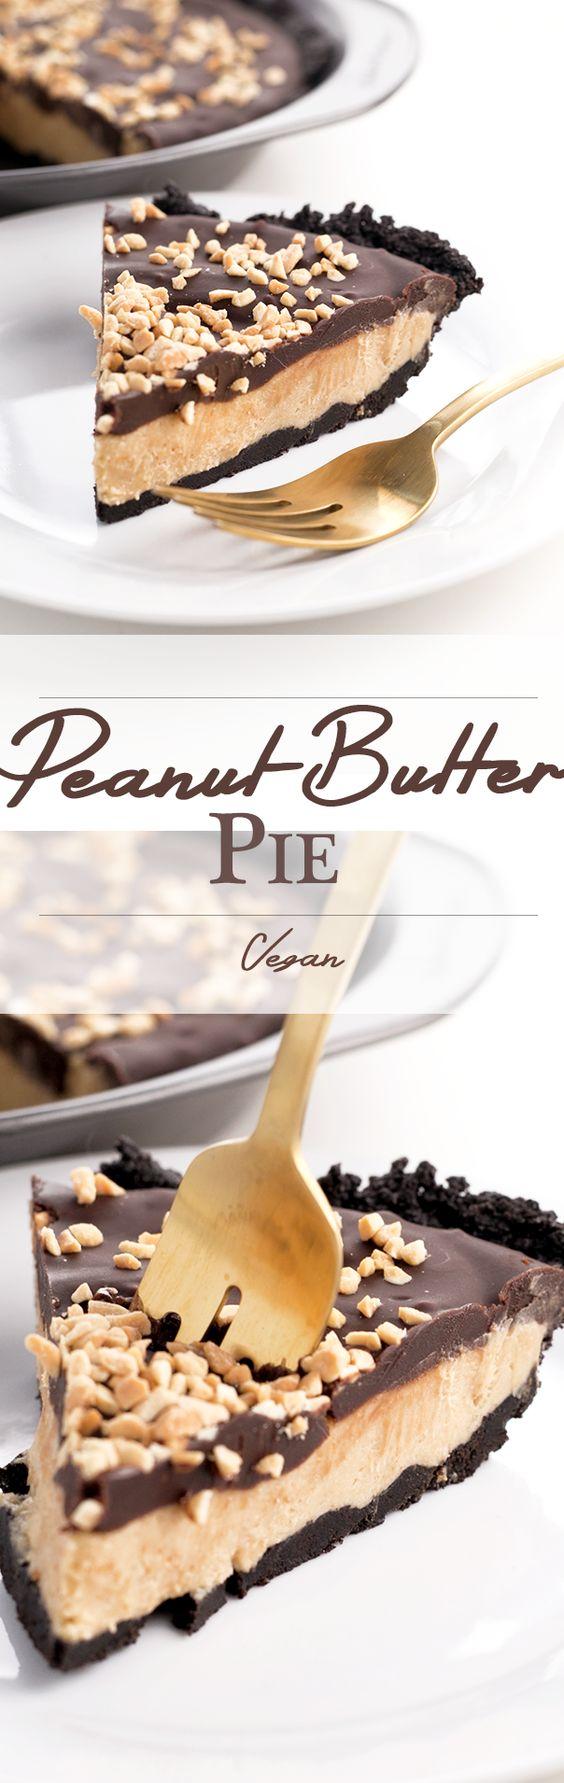 Easy to make vegan desserts?